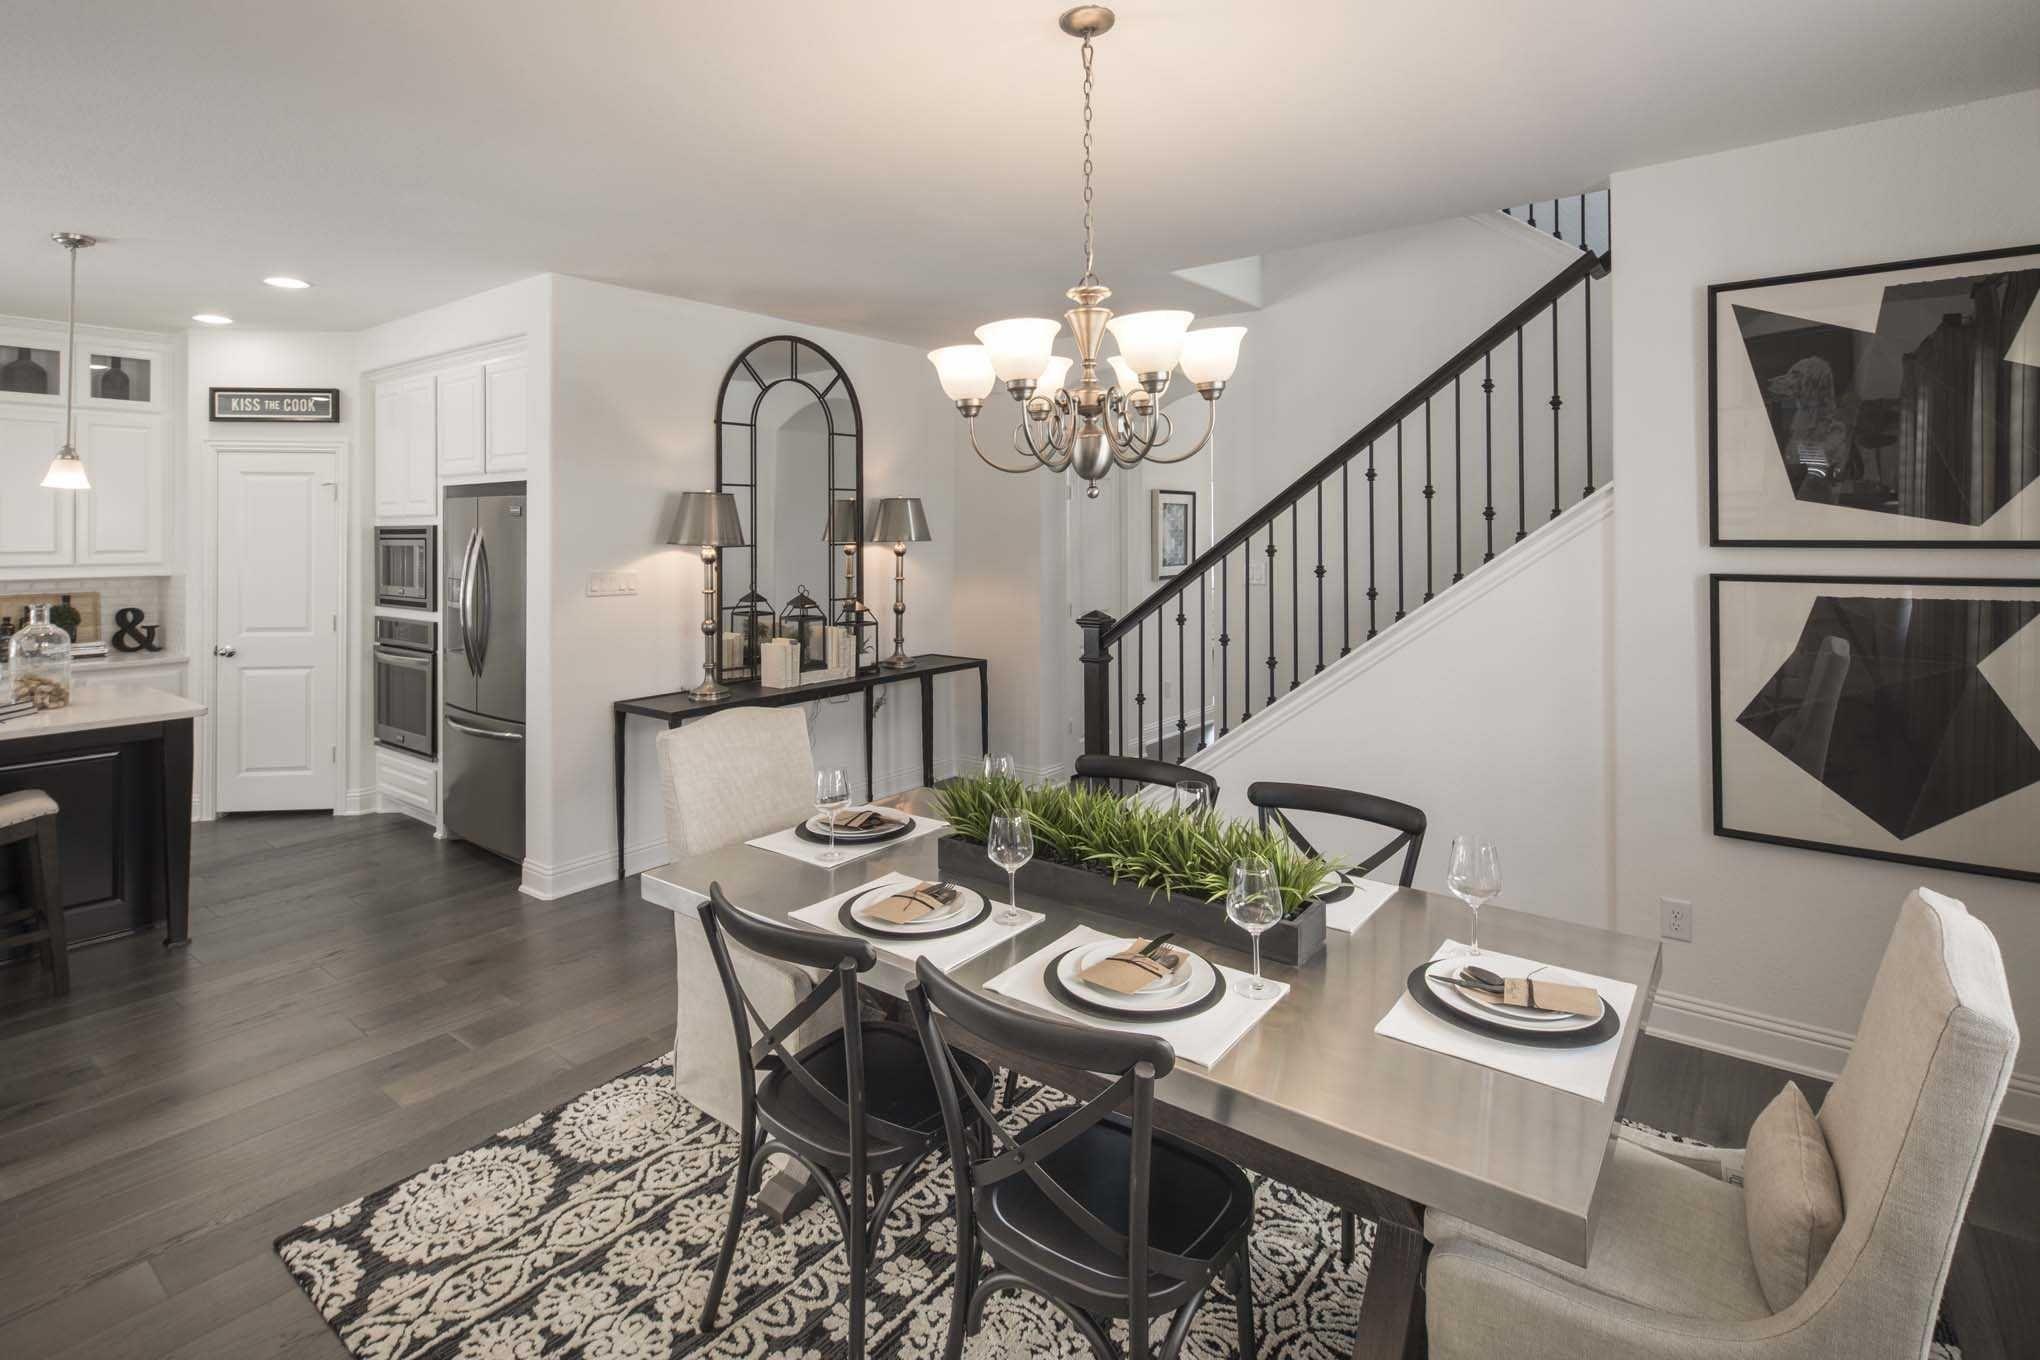 highland homes plan 306 model home in dallas fort worth texas rh pinterest com